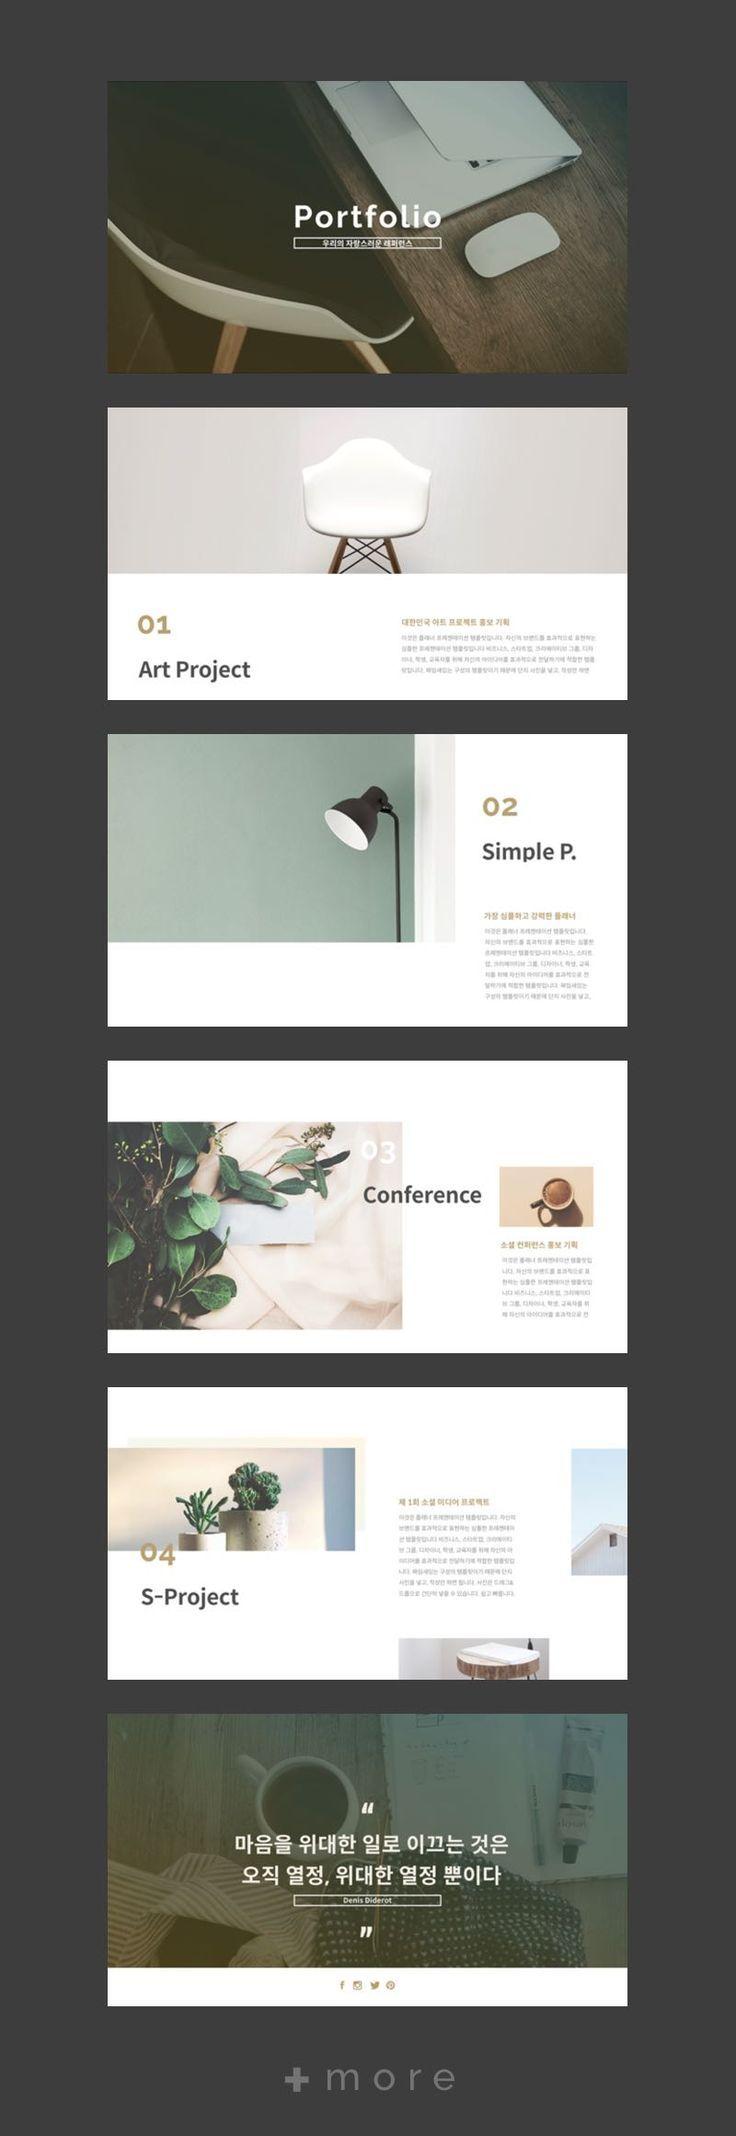 Simple layout design ideas simple minimal ppt presentation template